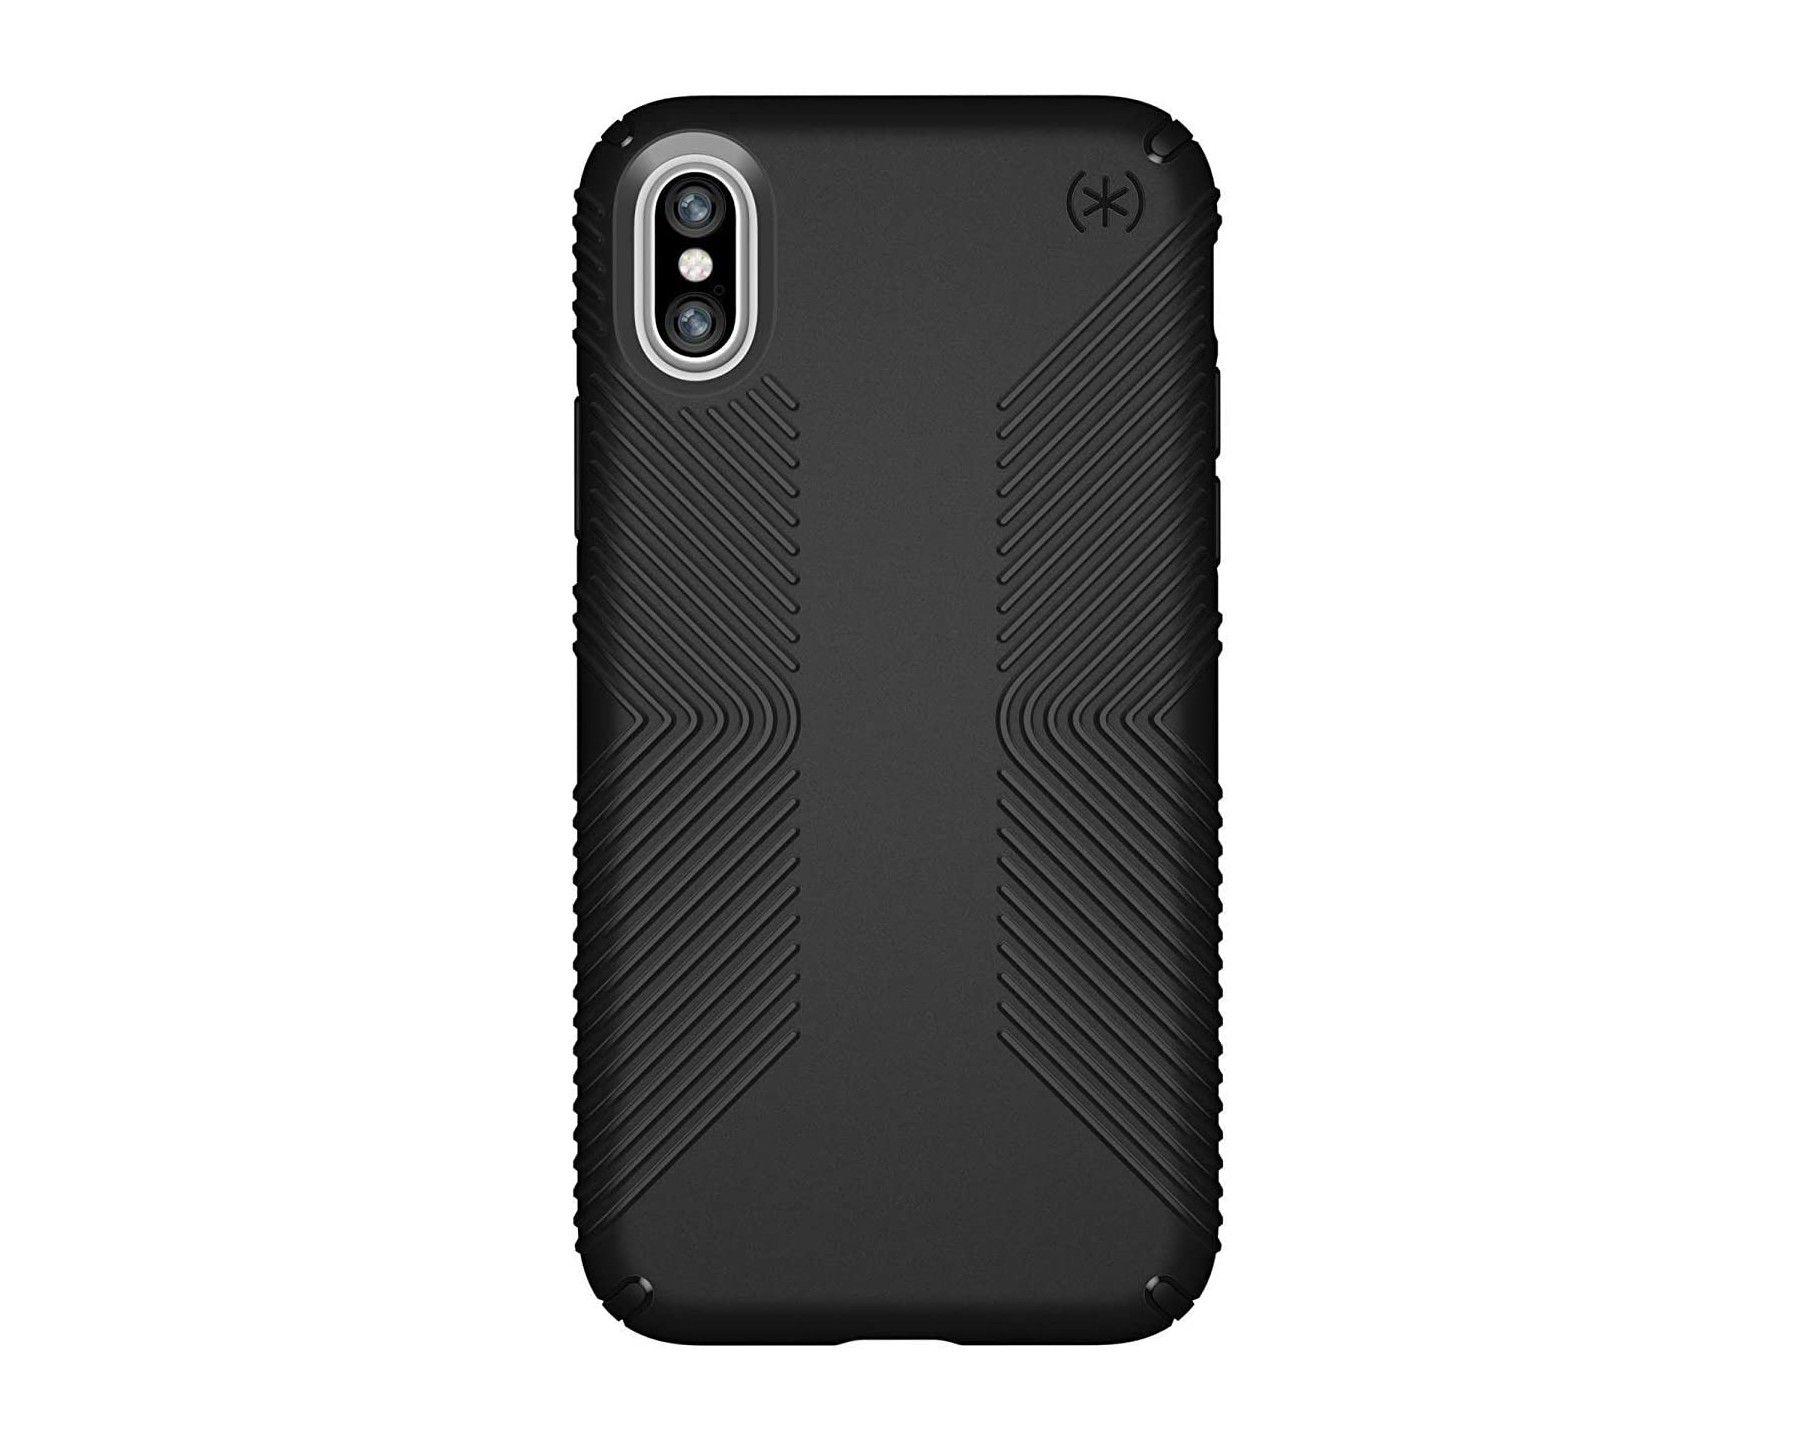 Speck Presidio Grip Case for iPhone X